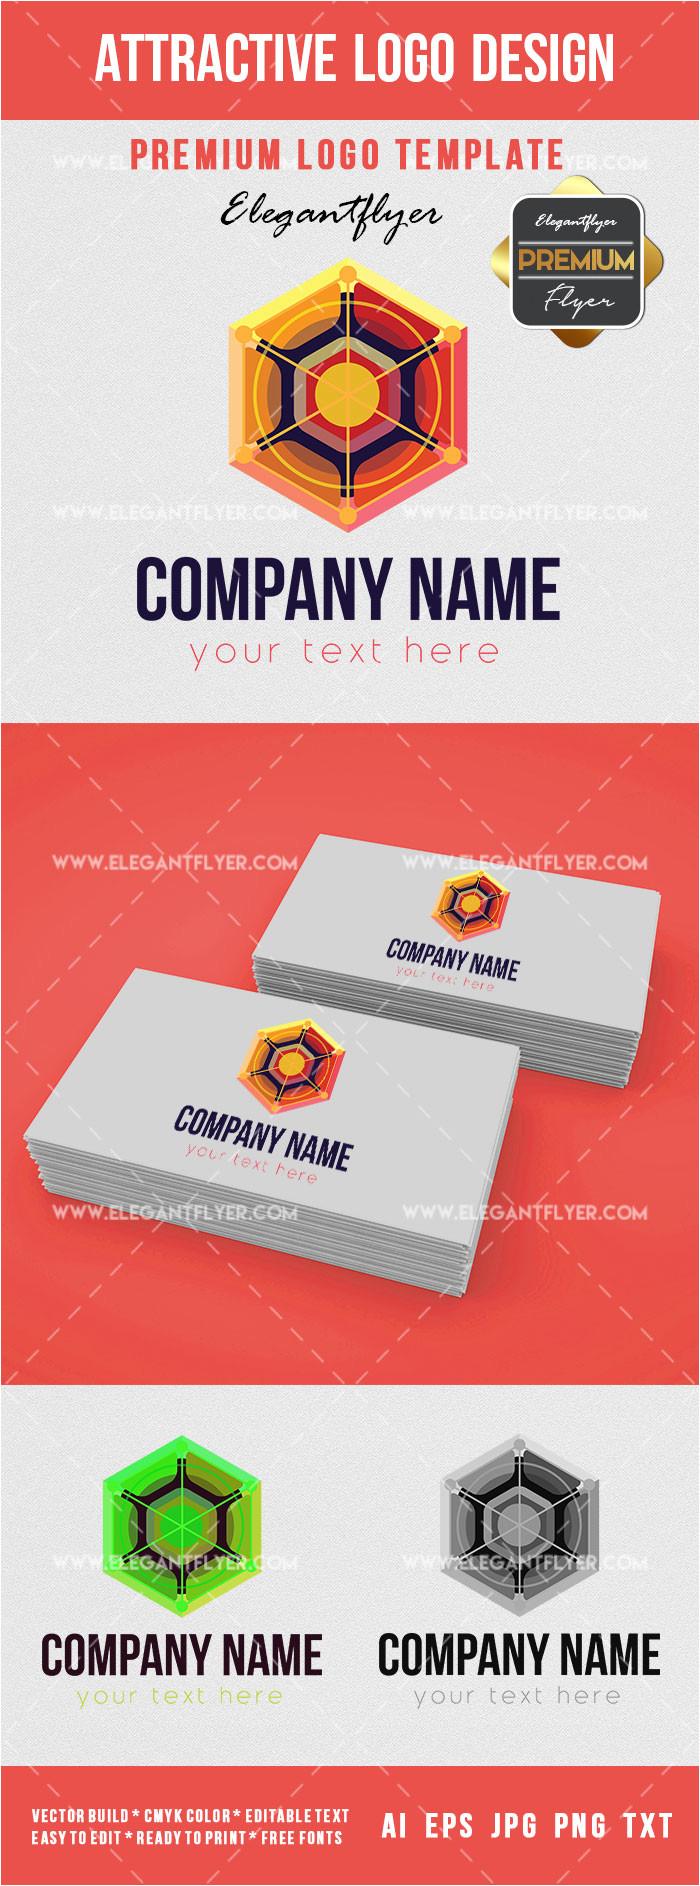 attractive design logotype premium logo template 2